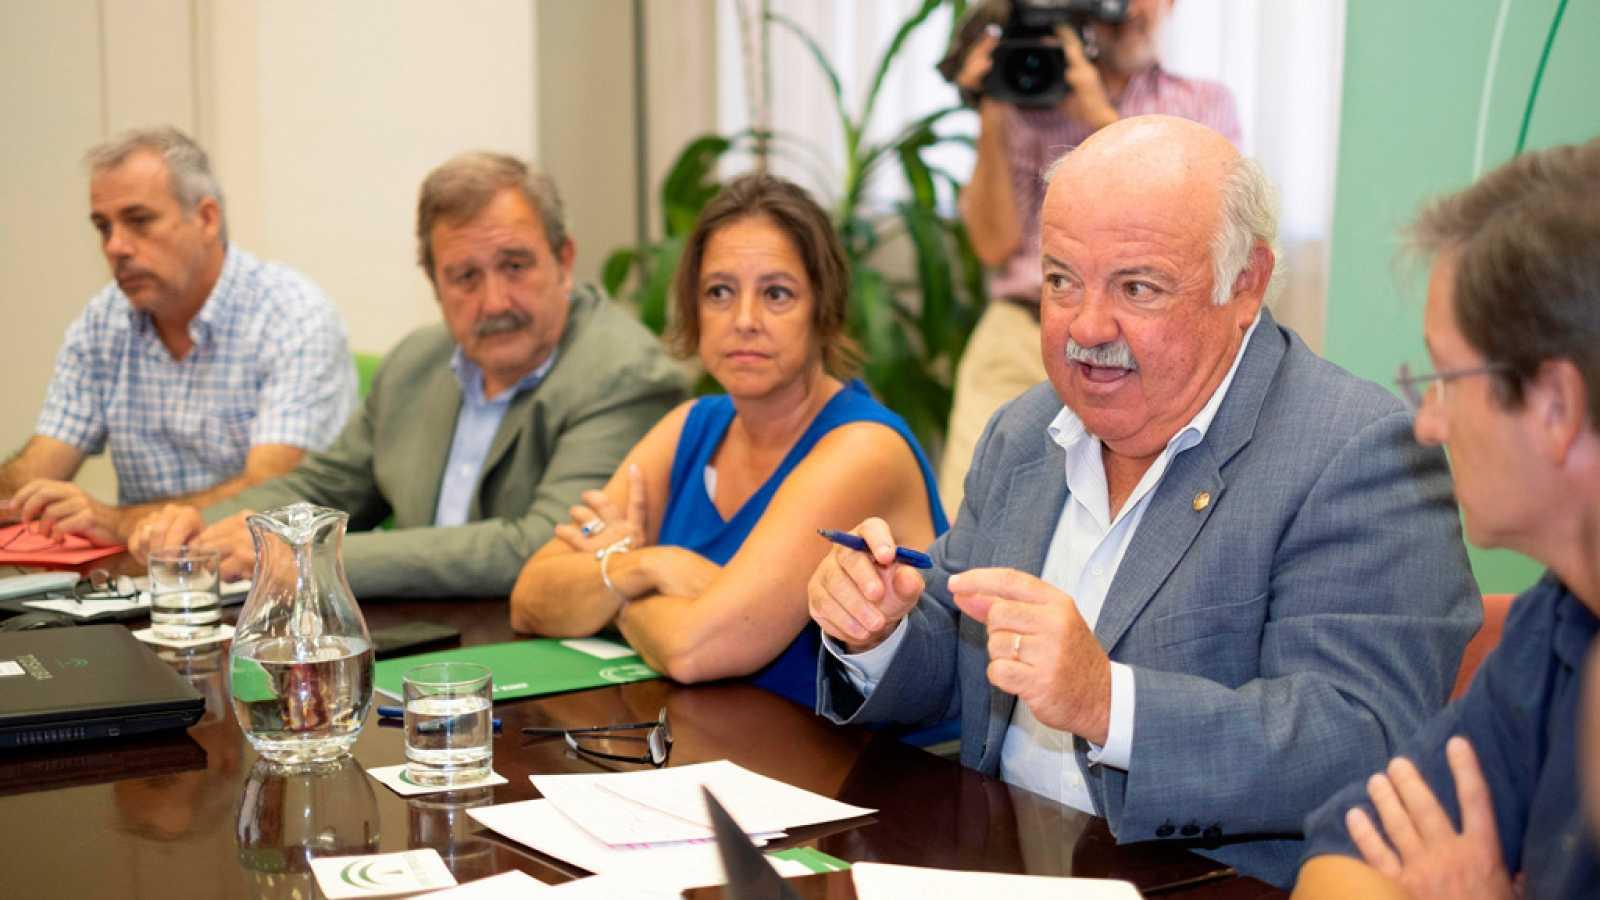 Aumentan a 56 los hospitalizados por listeriosis en Andalucía